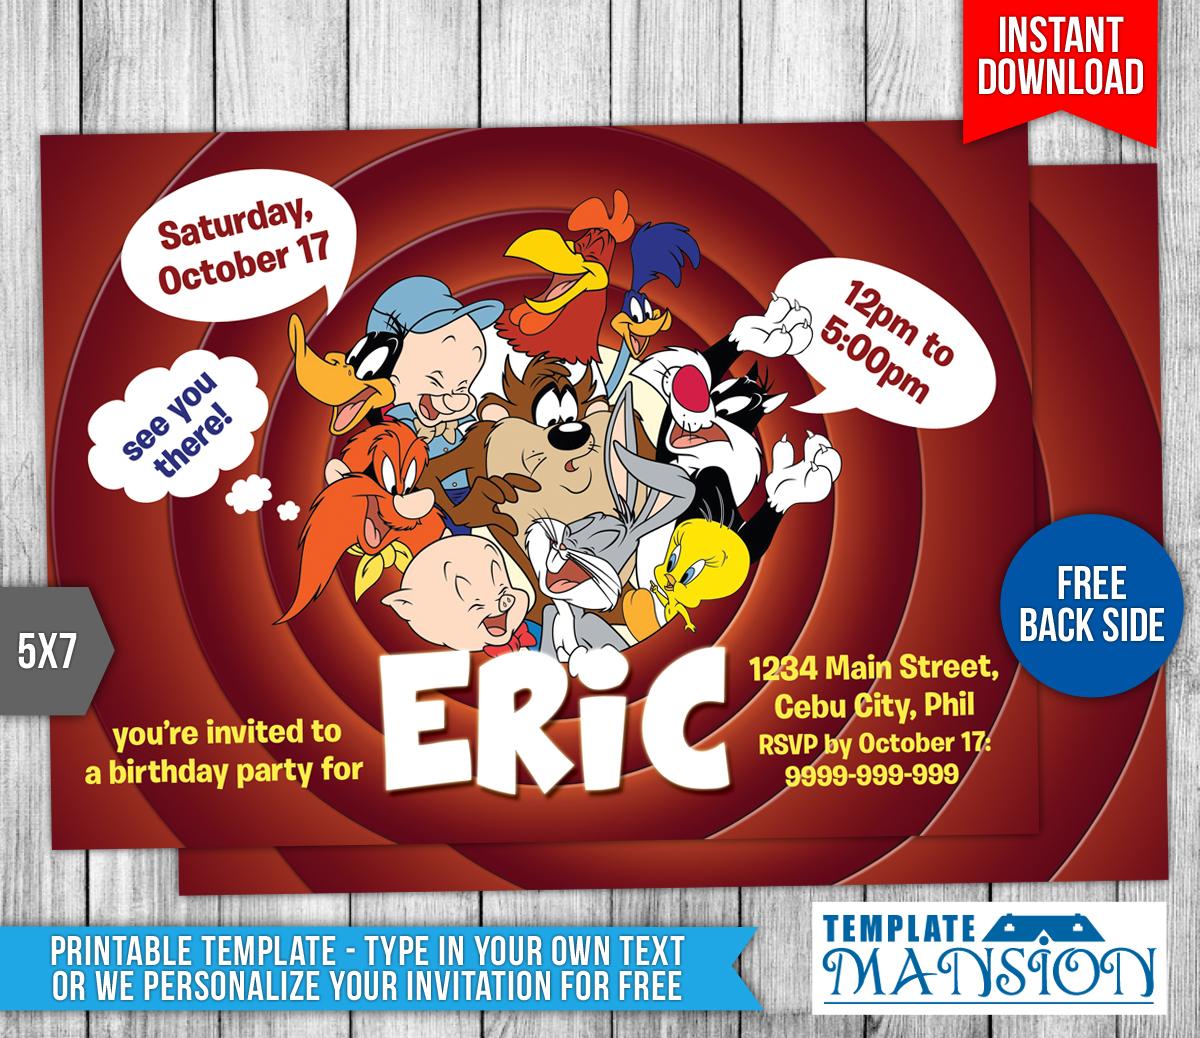 Looney Tunes Birthday Invitation Template 1 By Templatemansion On